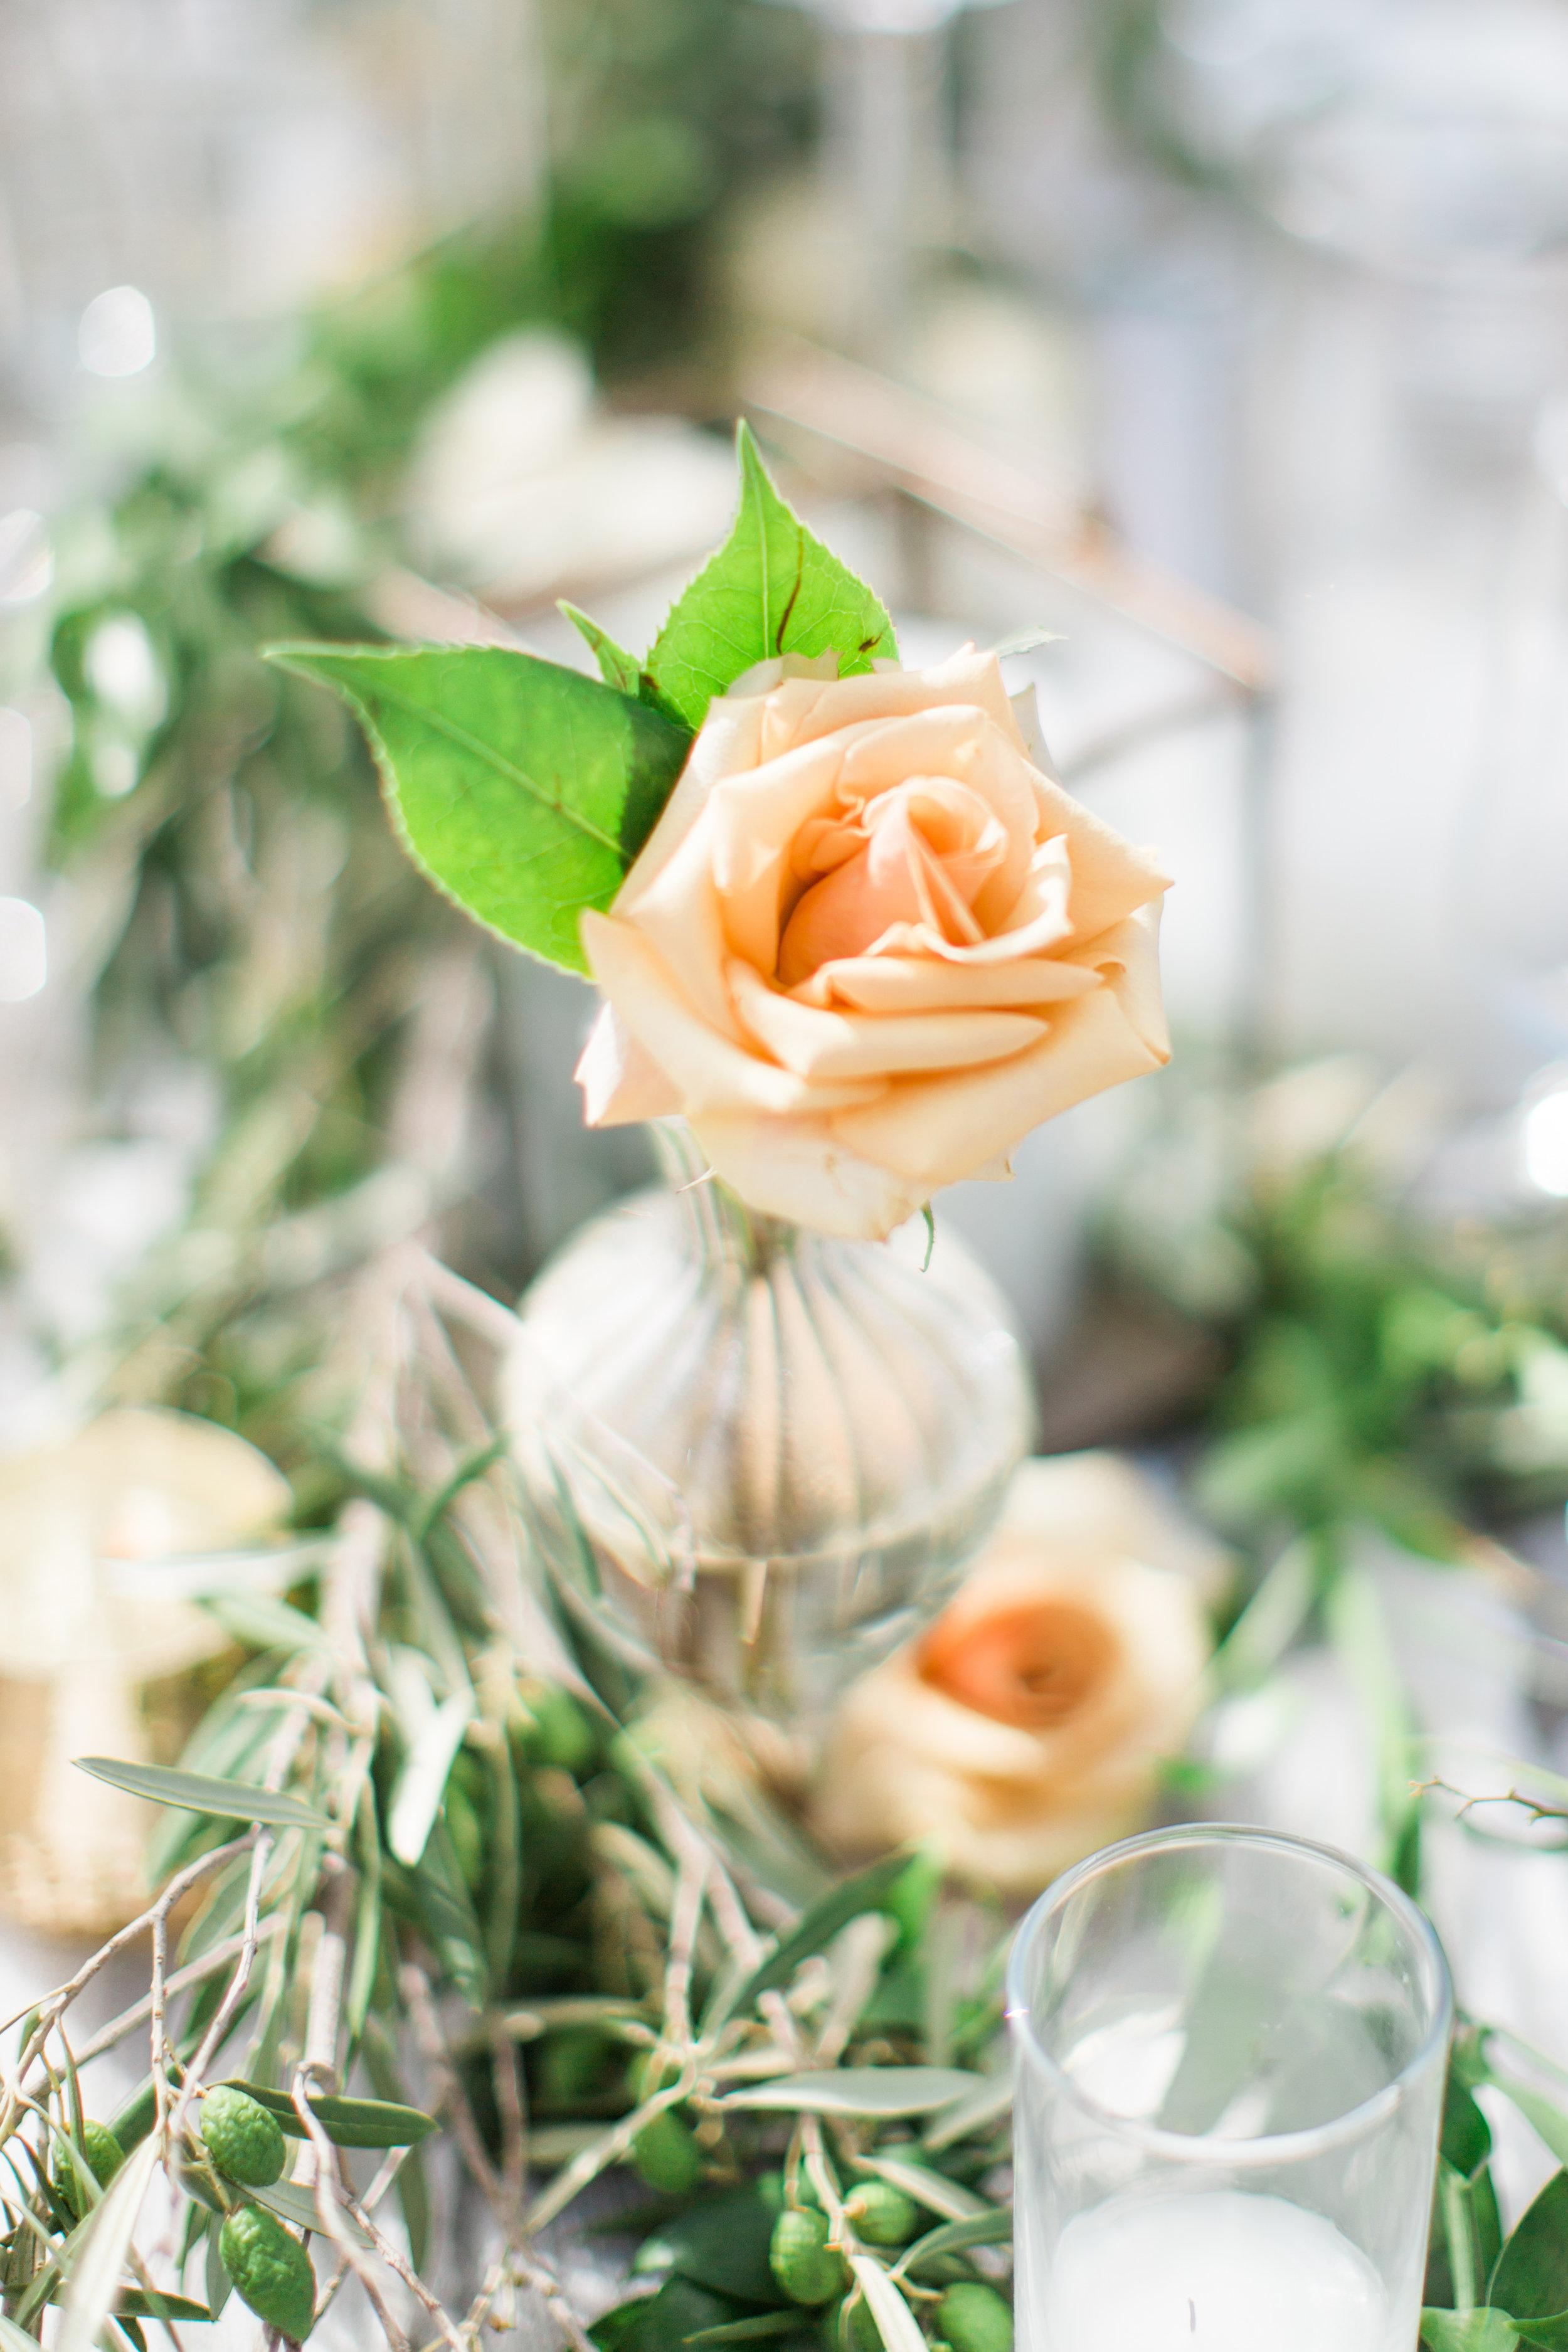 Blooms-breesa-lee-luxury-florist-aga-jones-tres-chic-affairs-san-diego-wedding-classic-coast-catering-74).jpg